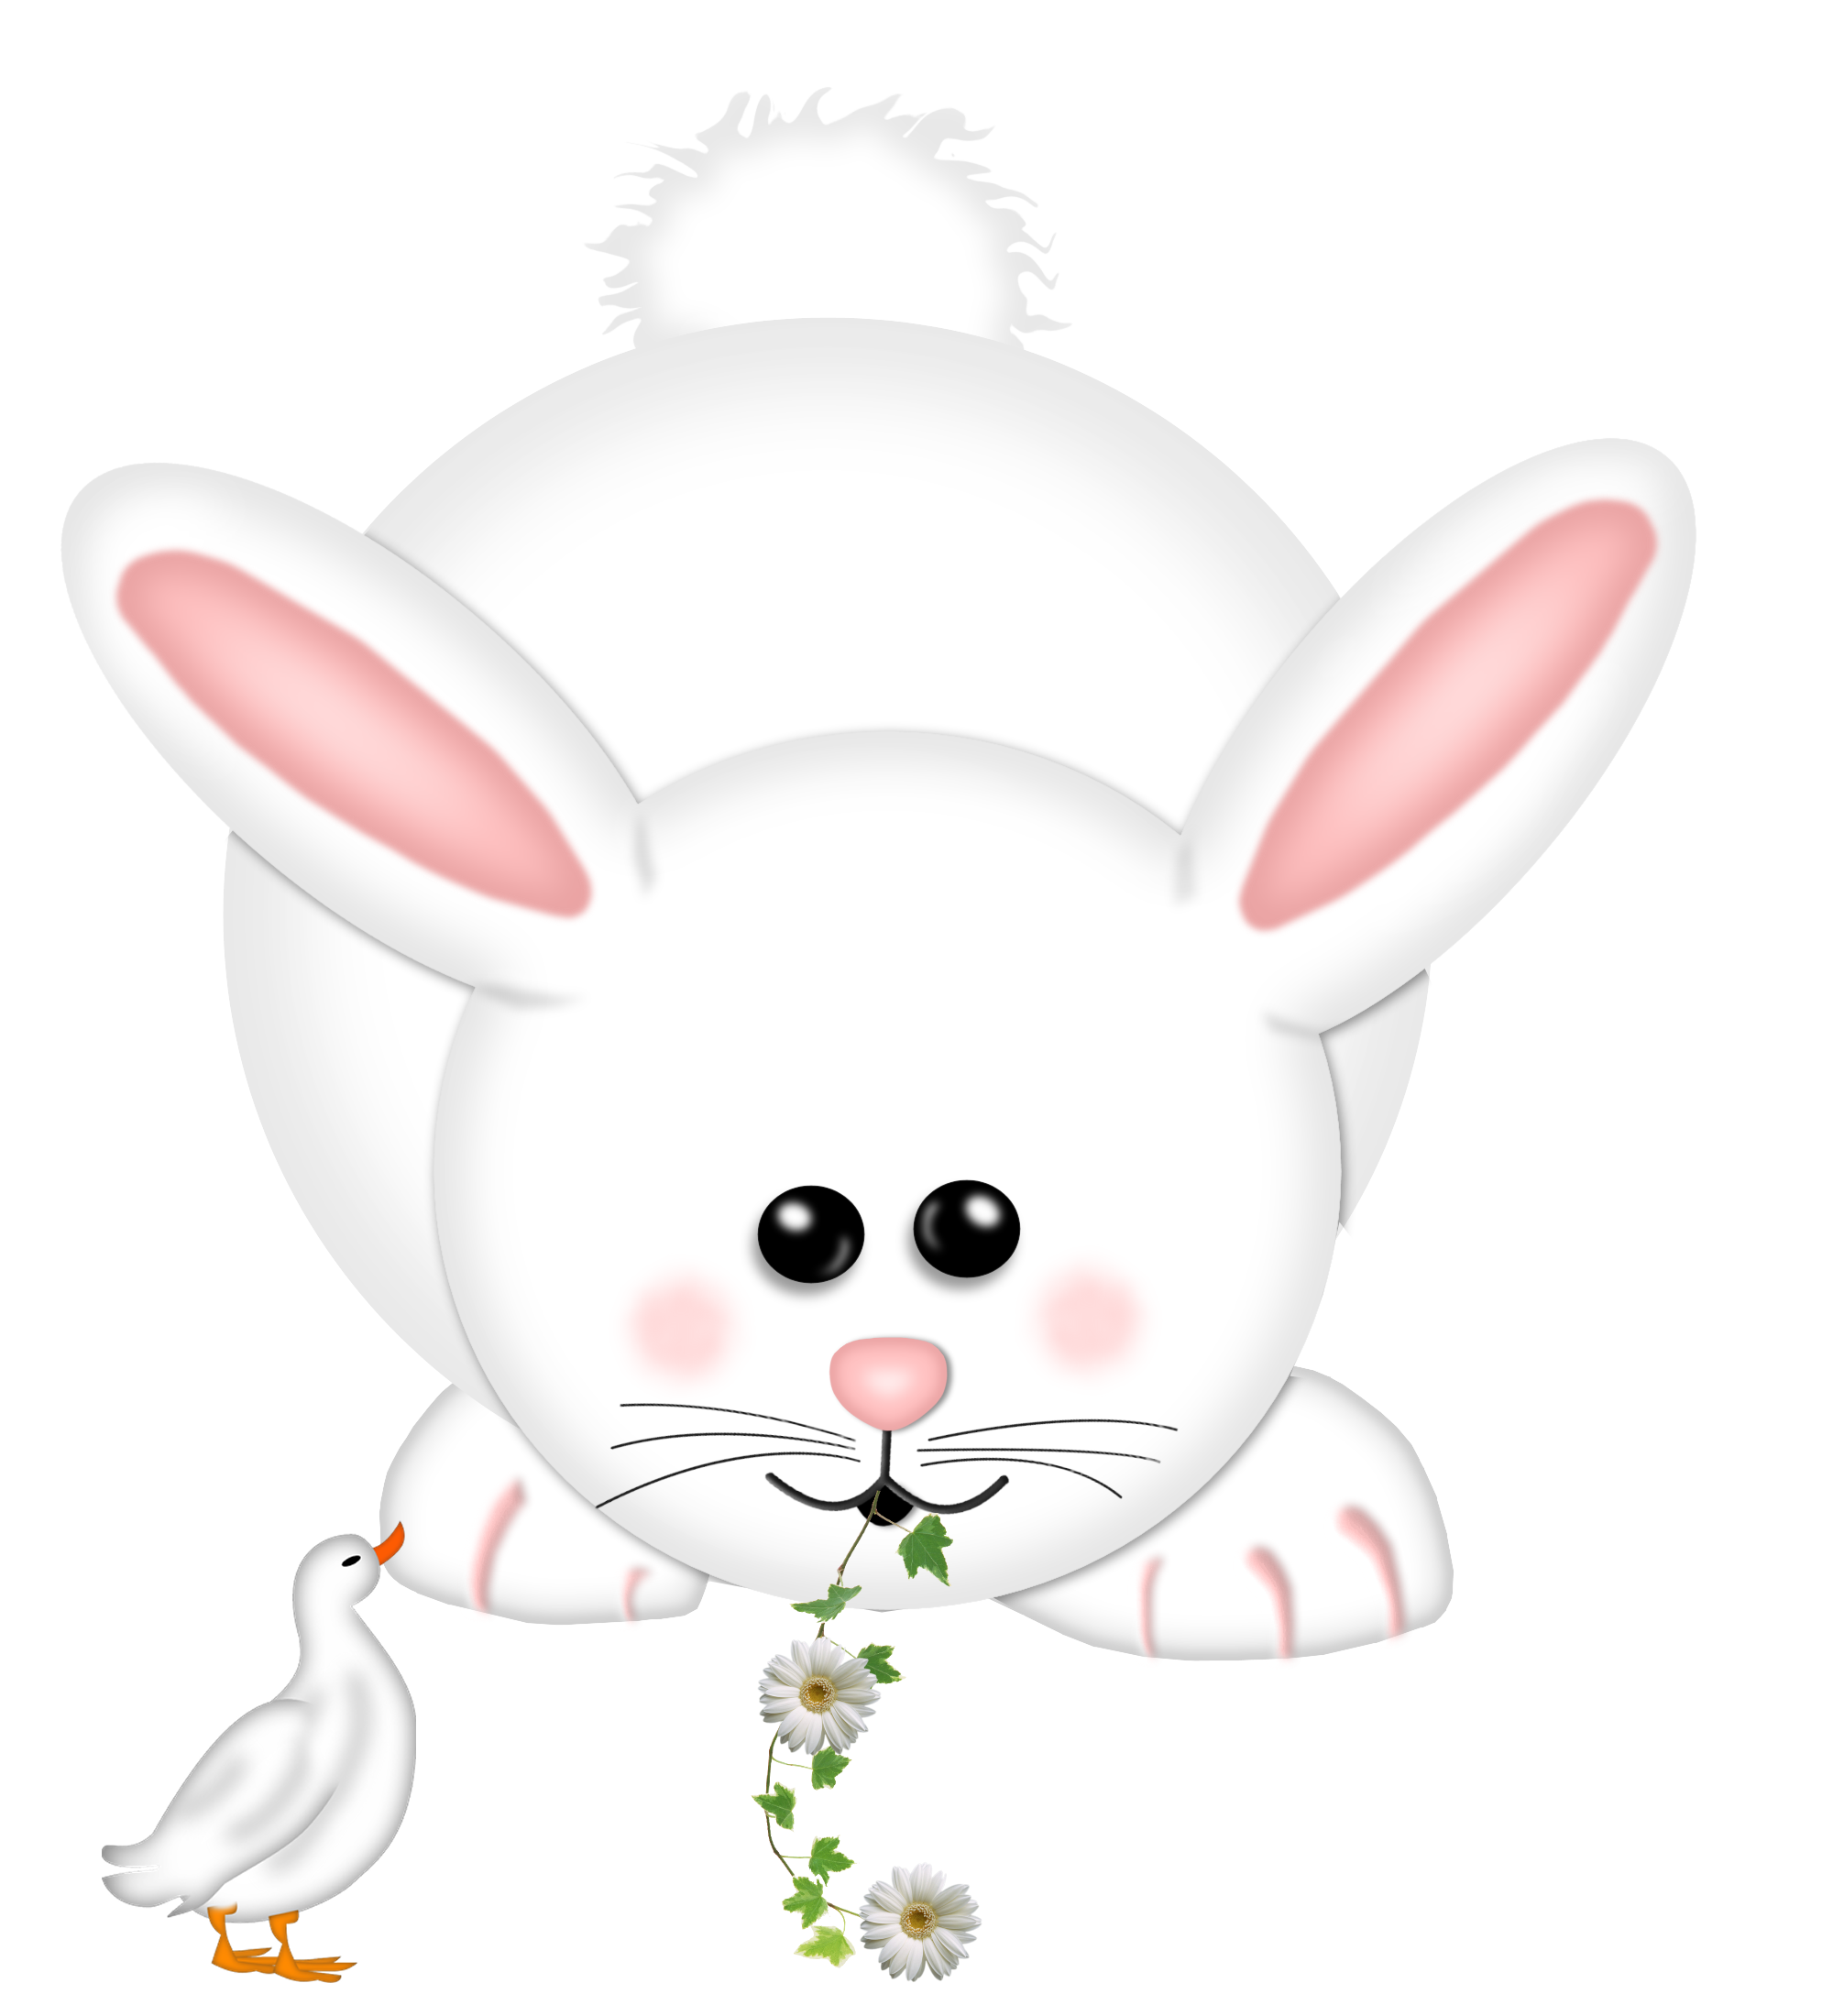 Feet clipart bunny ear. February archive svet klip